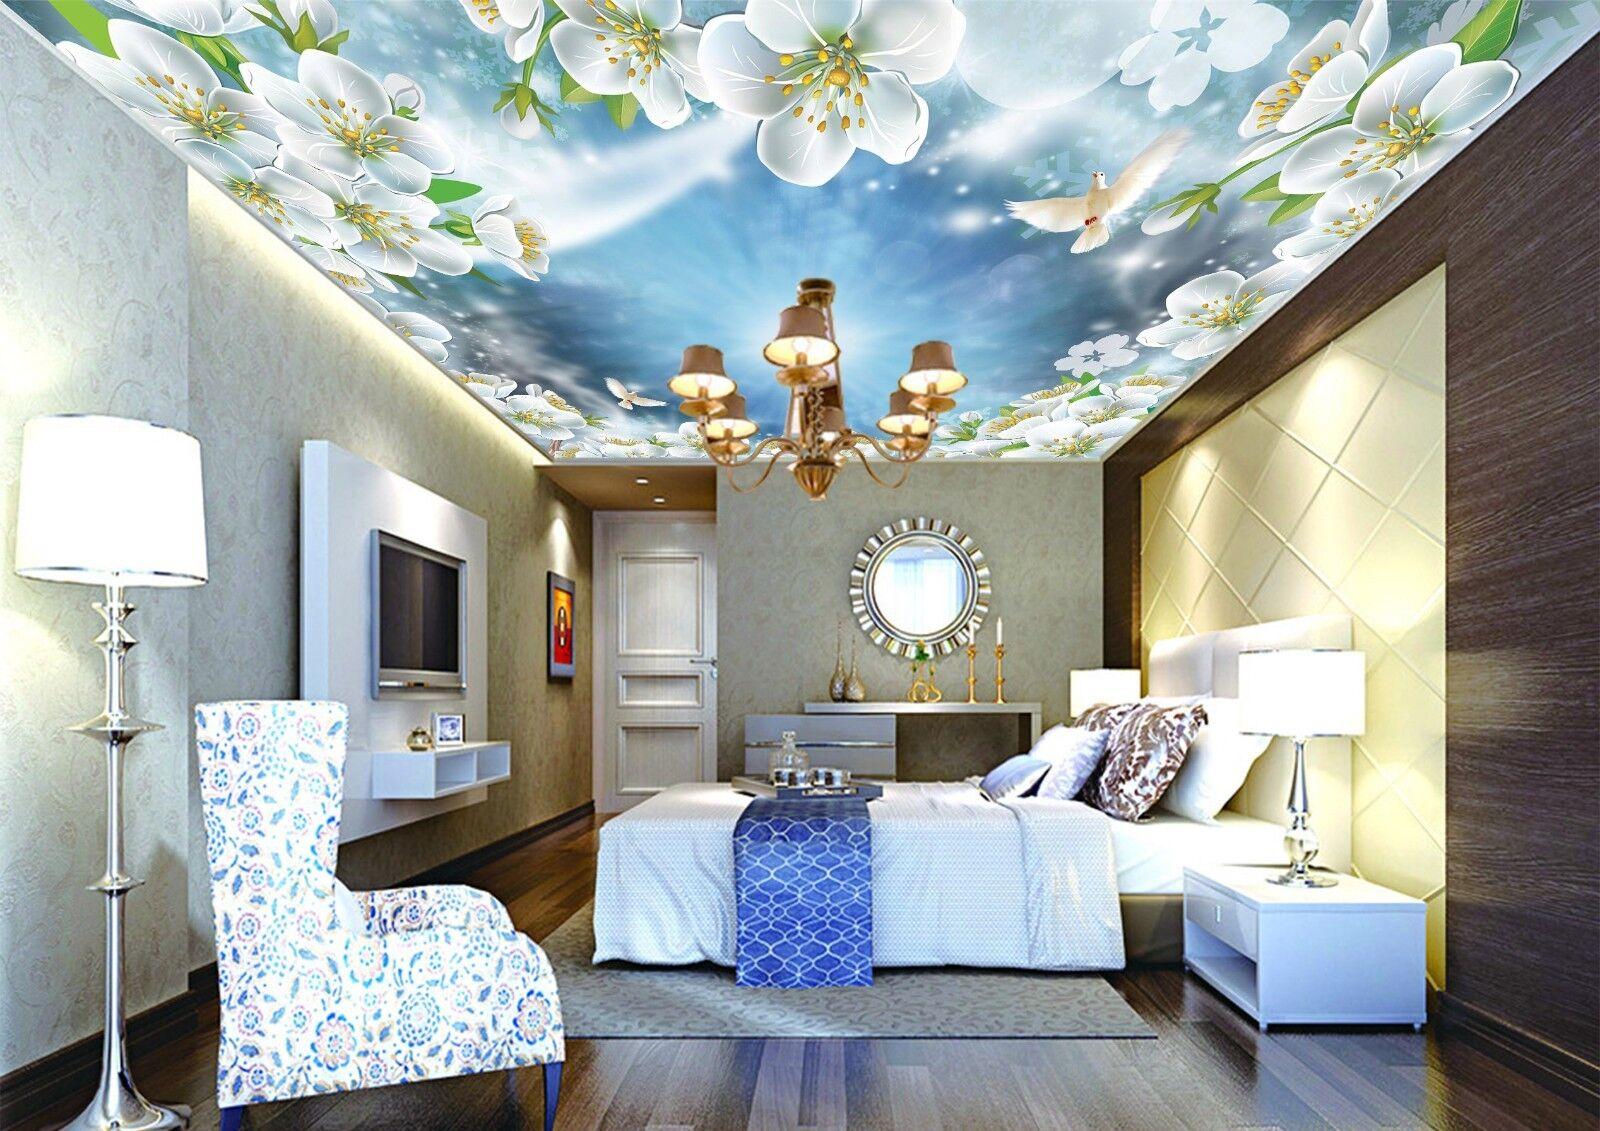 3D Weiß Flower Dove 8 Wall Paper Wall Print Decal Wall Deco AJ WALLPAPER Summer